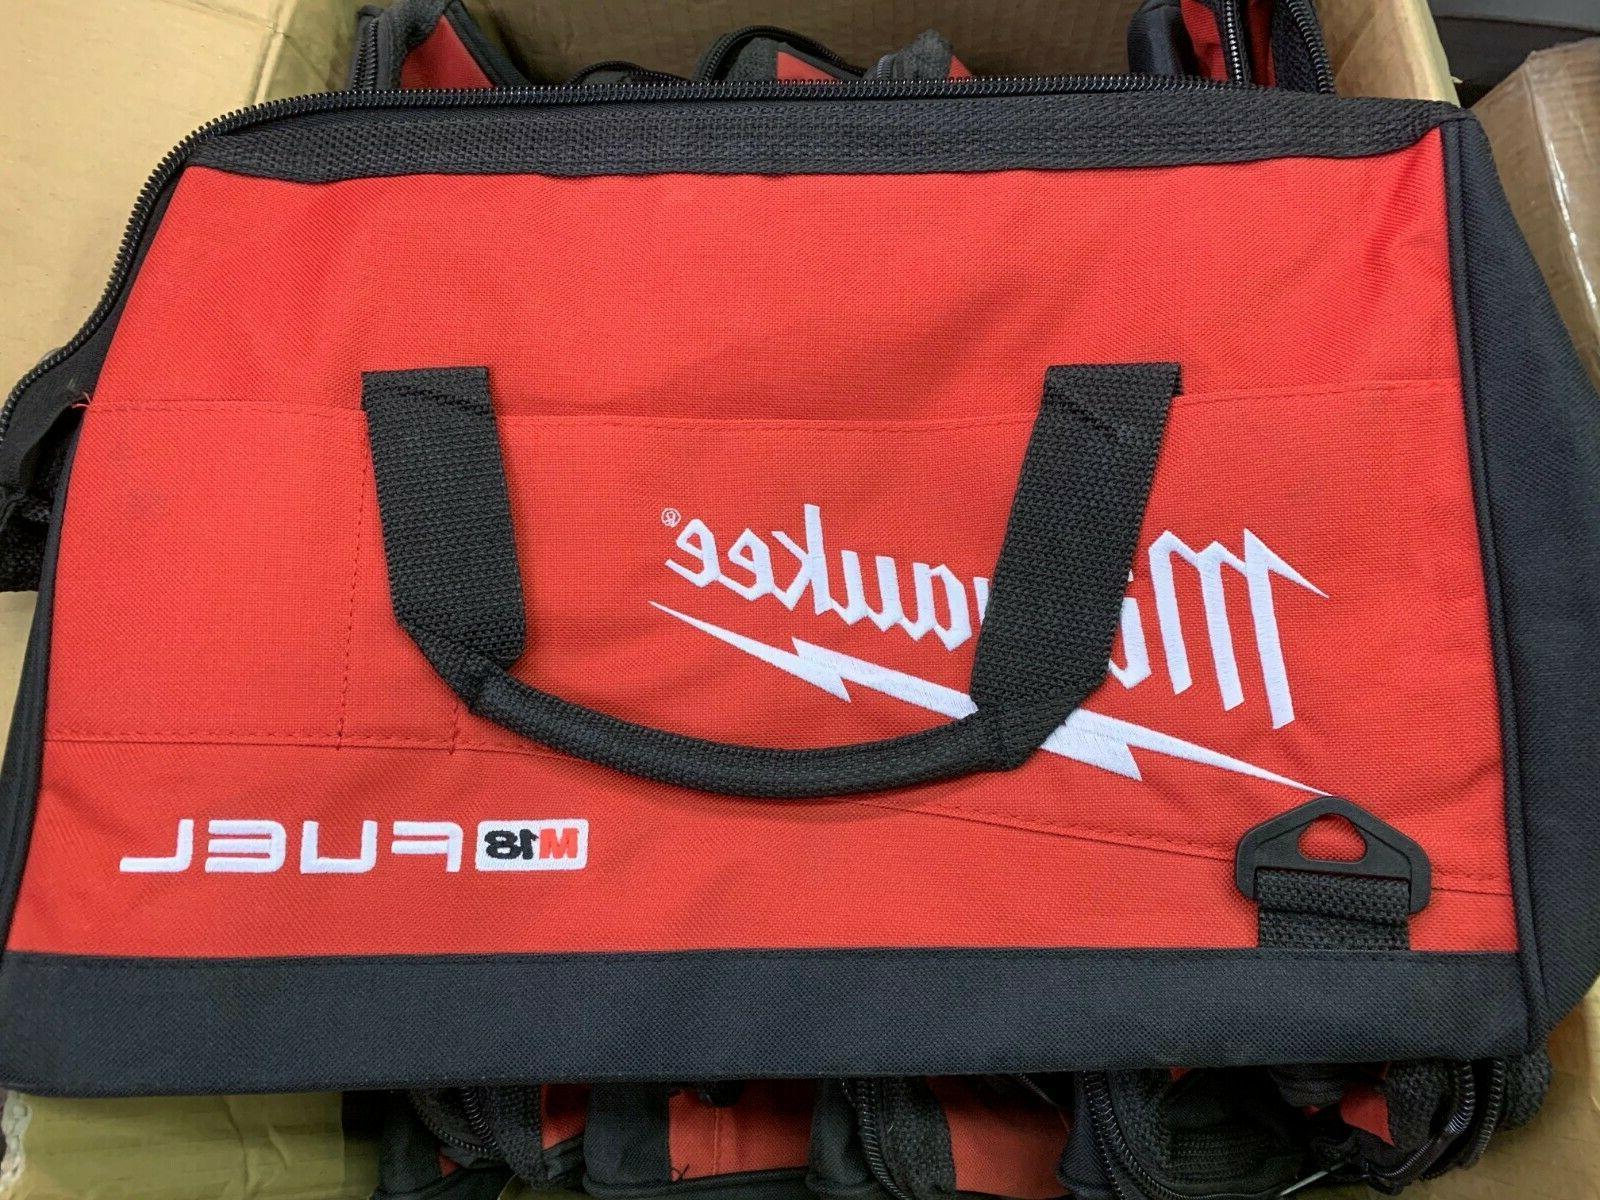 heavy duty m18 fuel tool bag fits